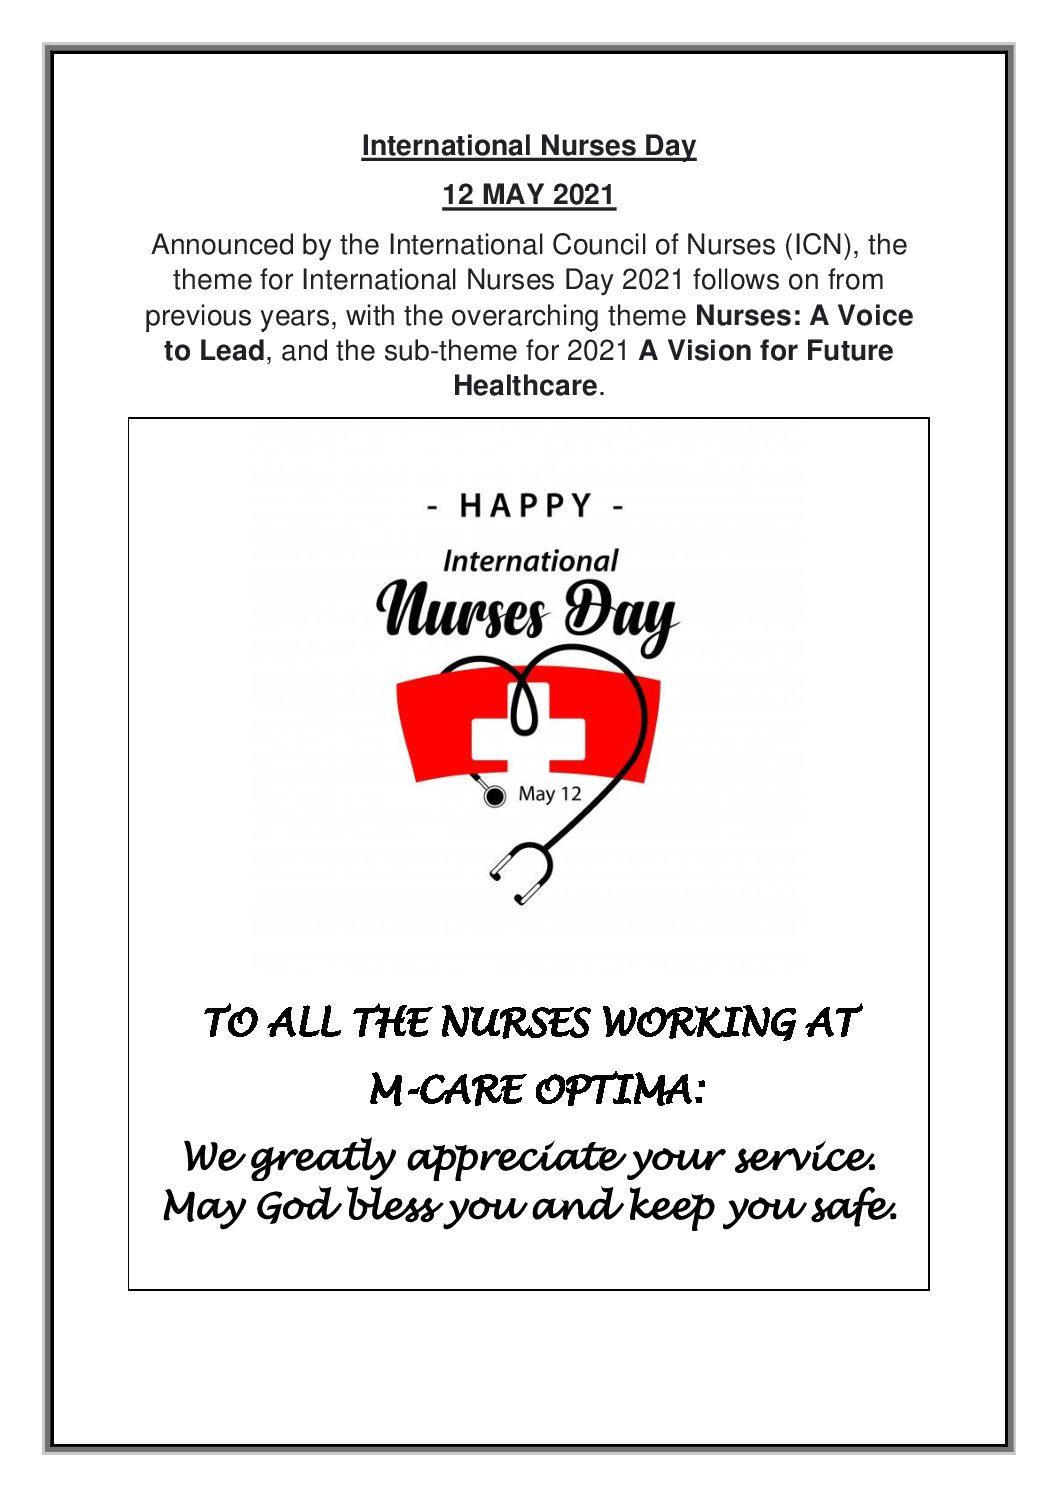 INTERNATIONAL-NURSES-DAY-pdf.jpg